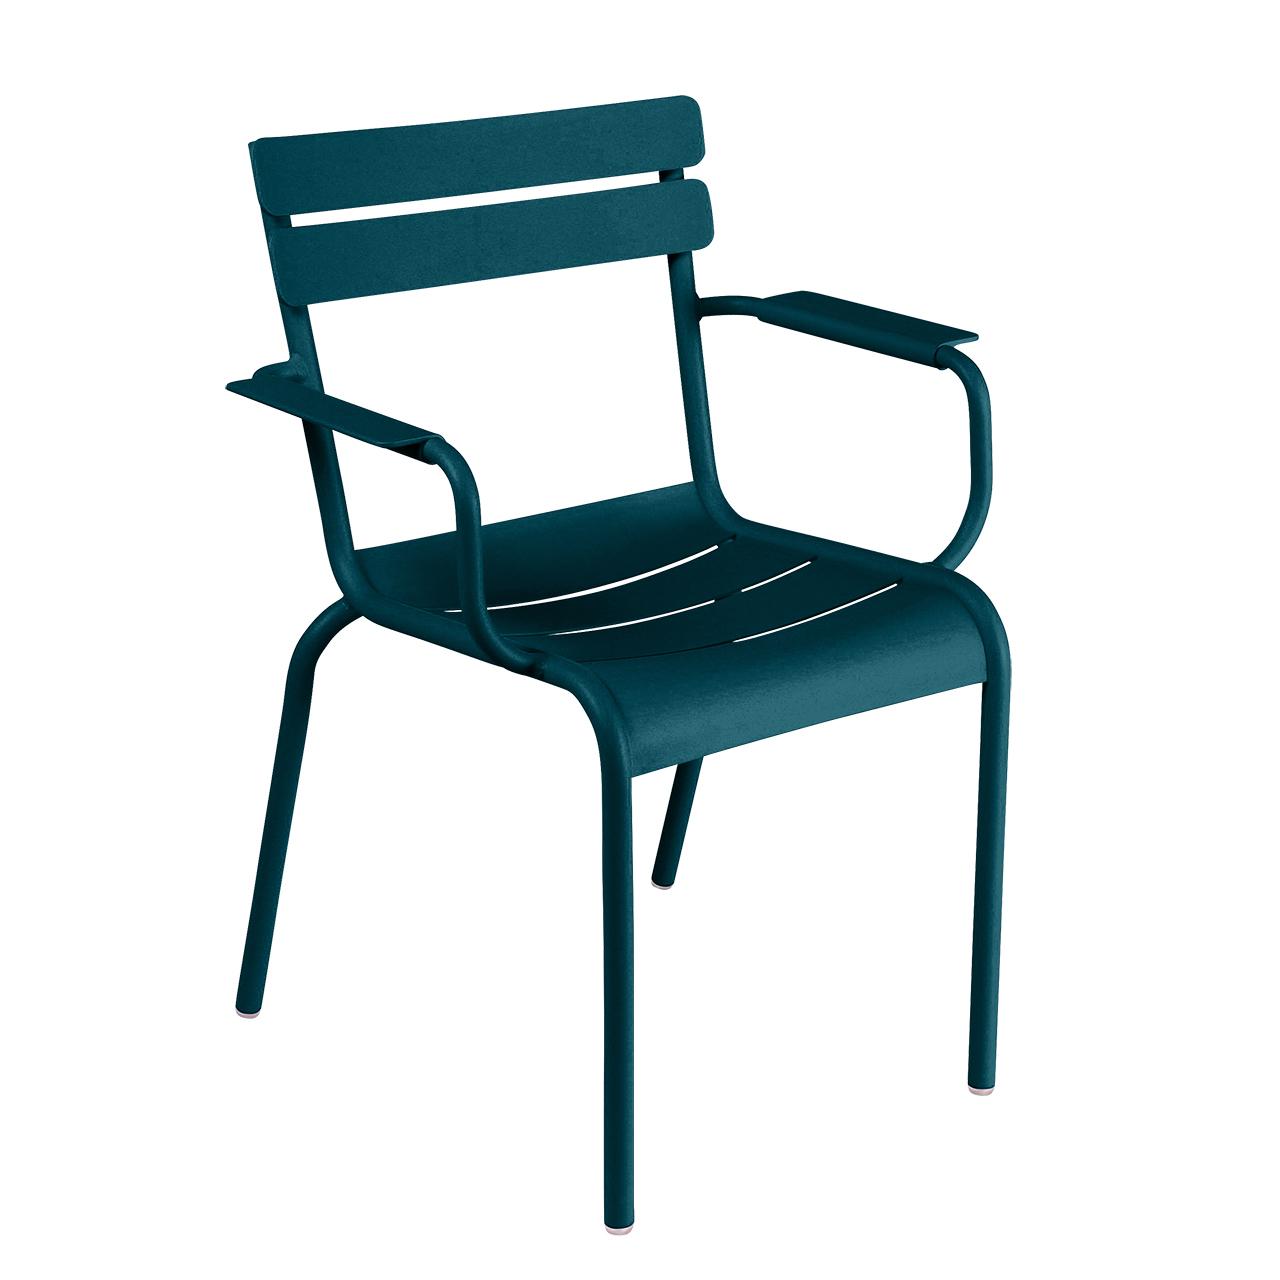 Fermob Luxembourg Stuhl  Stuhl mit Armlehnen,  Acapulcoblau 21 NEU